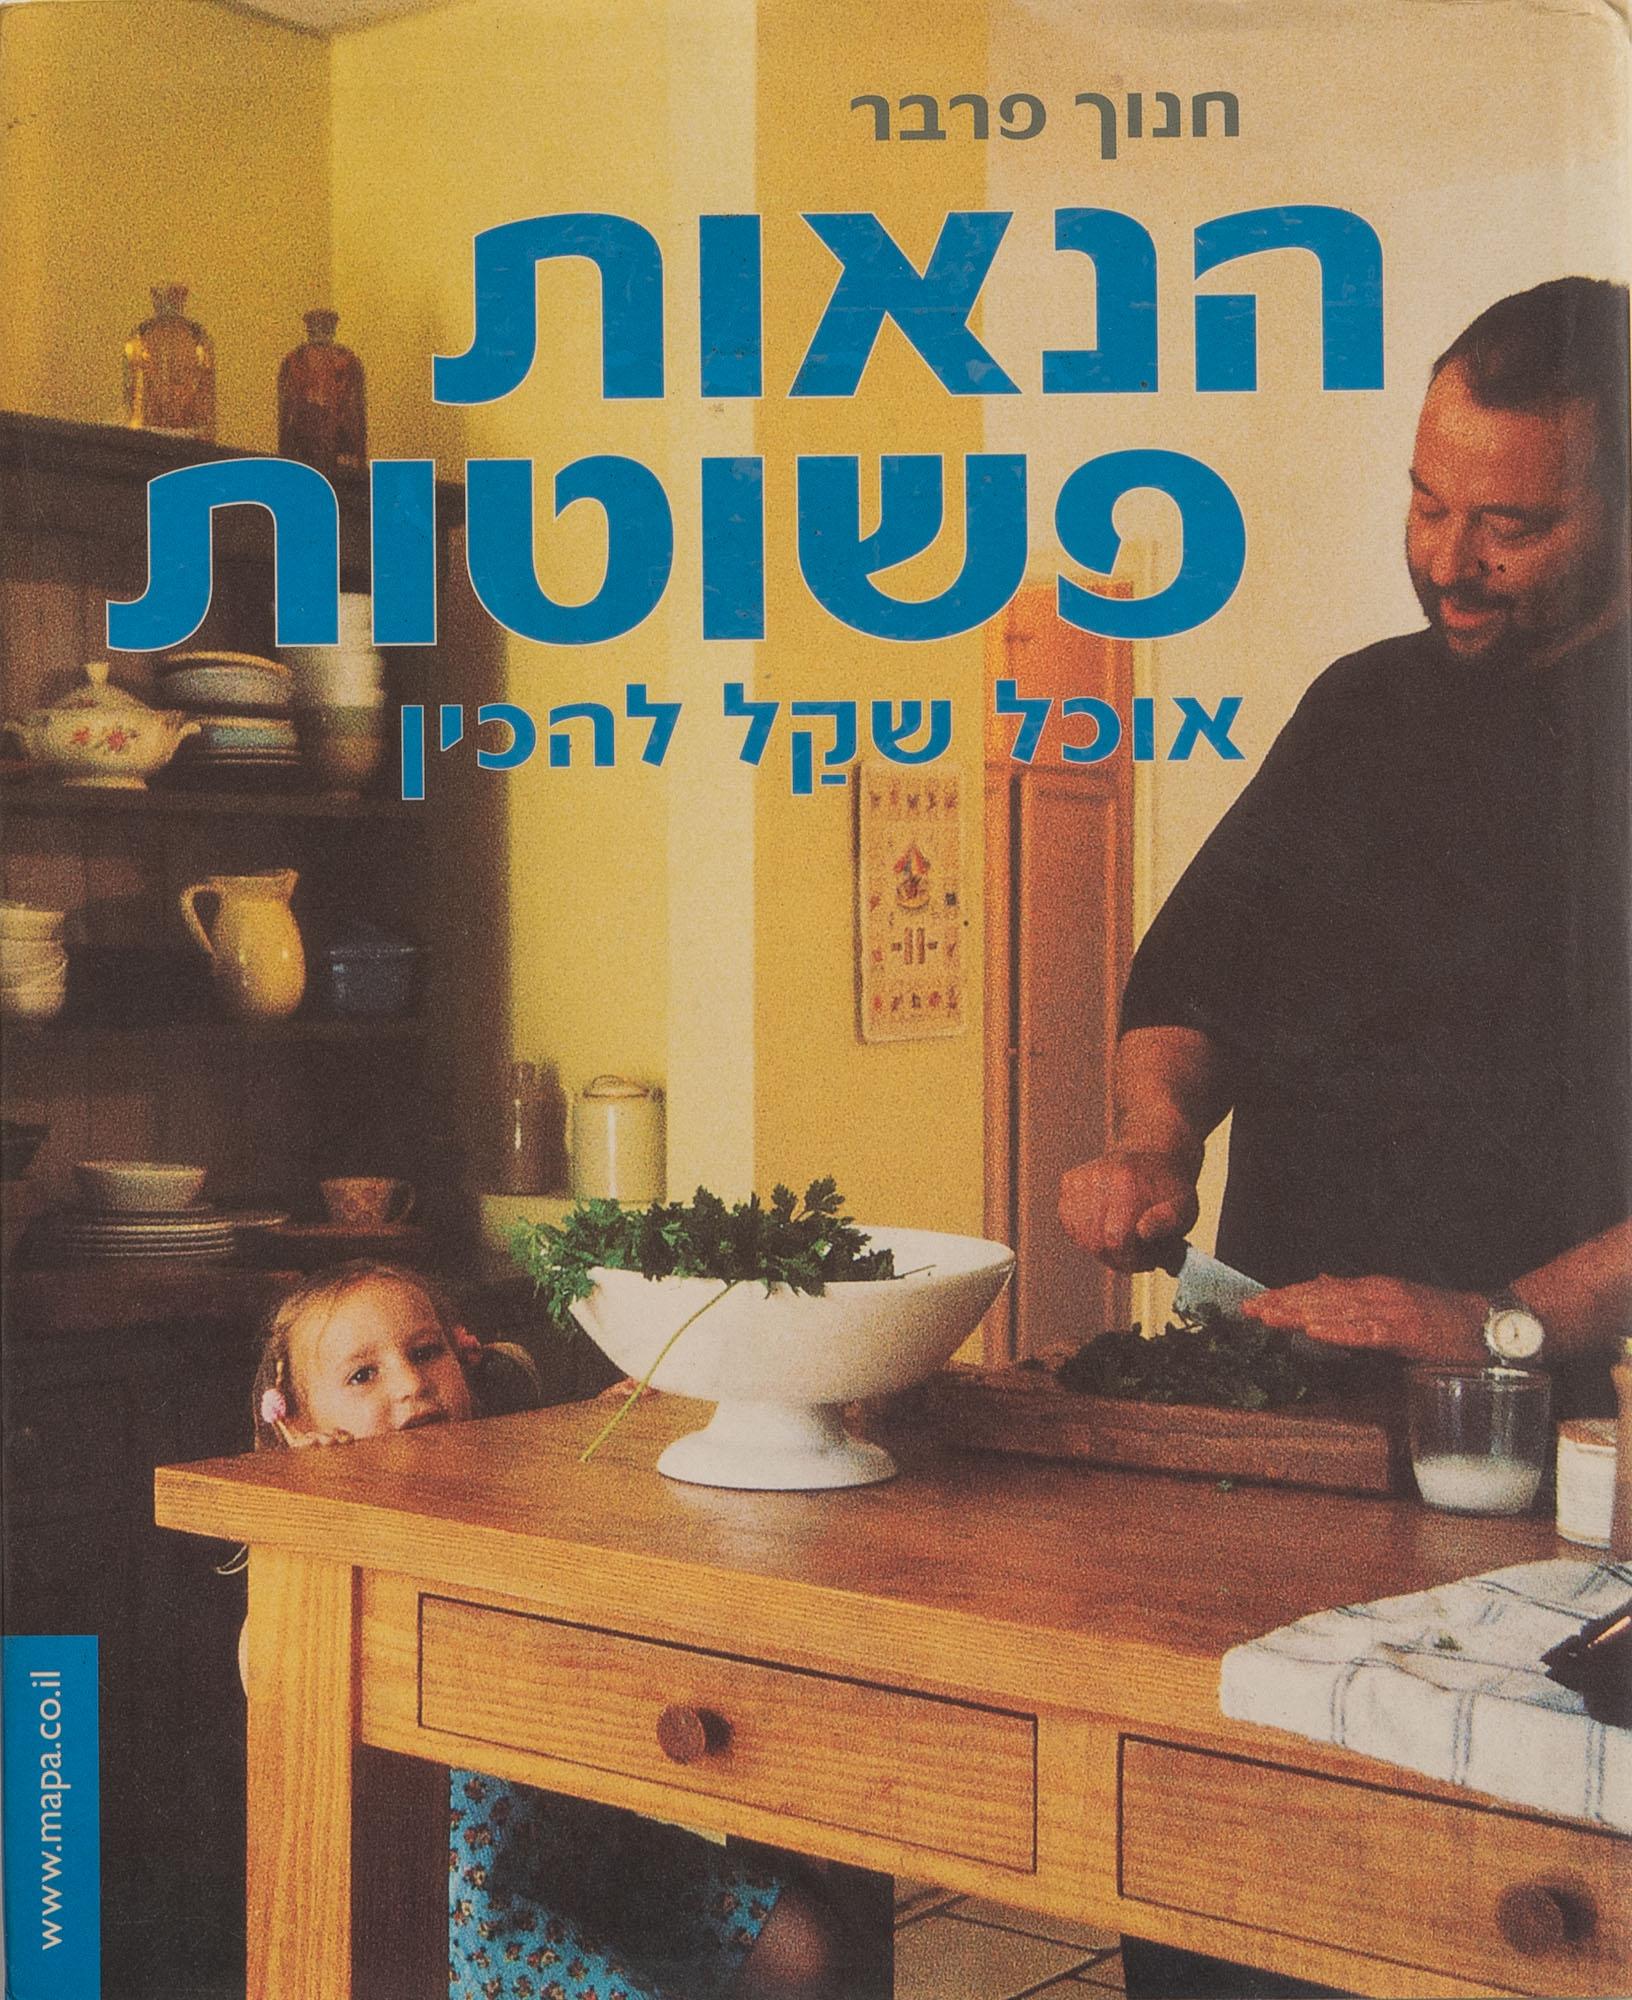 The cover of the Israeli cookbook Simple Pleasures